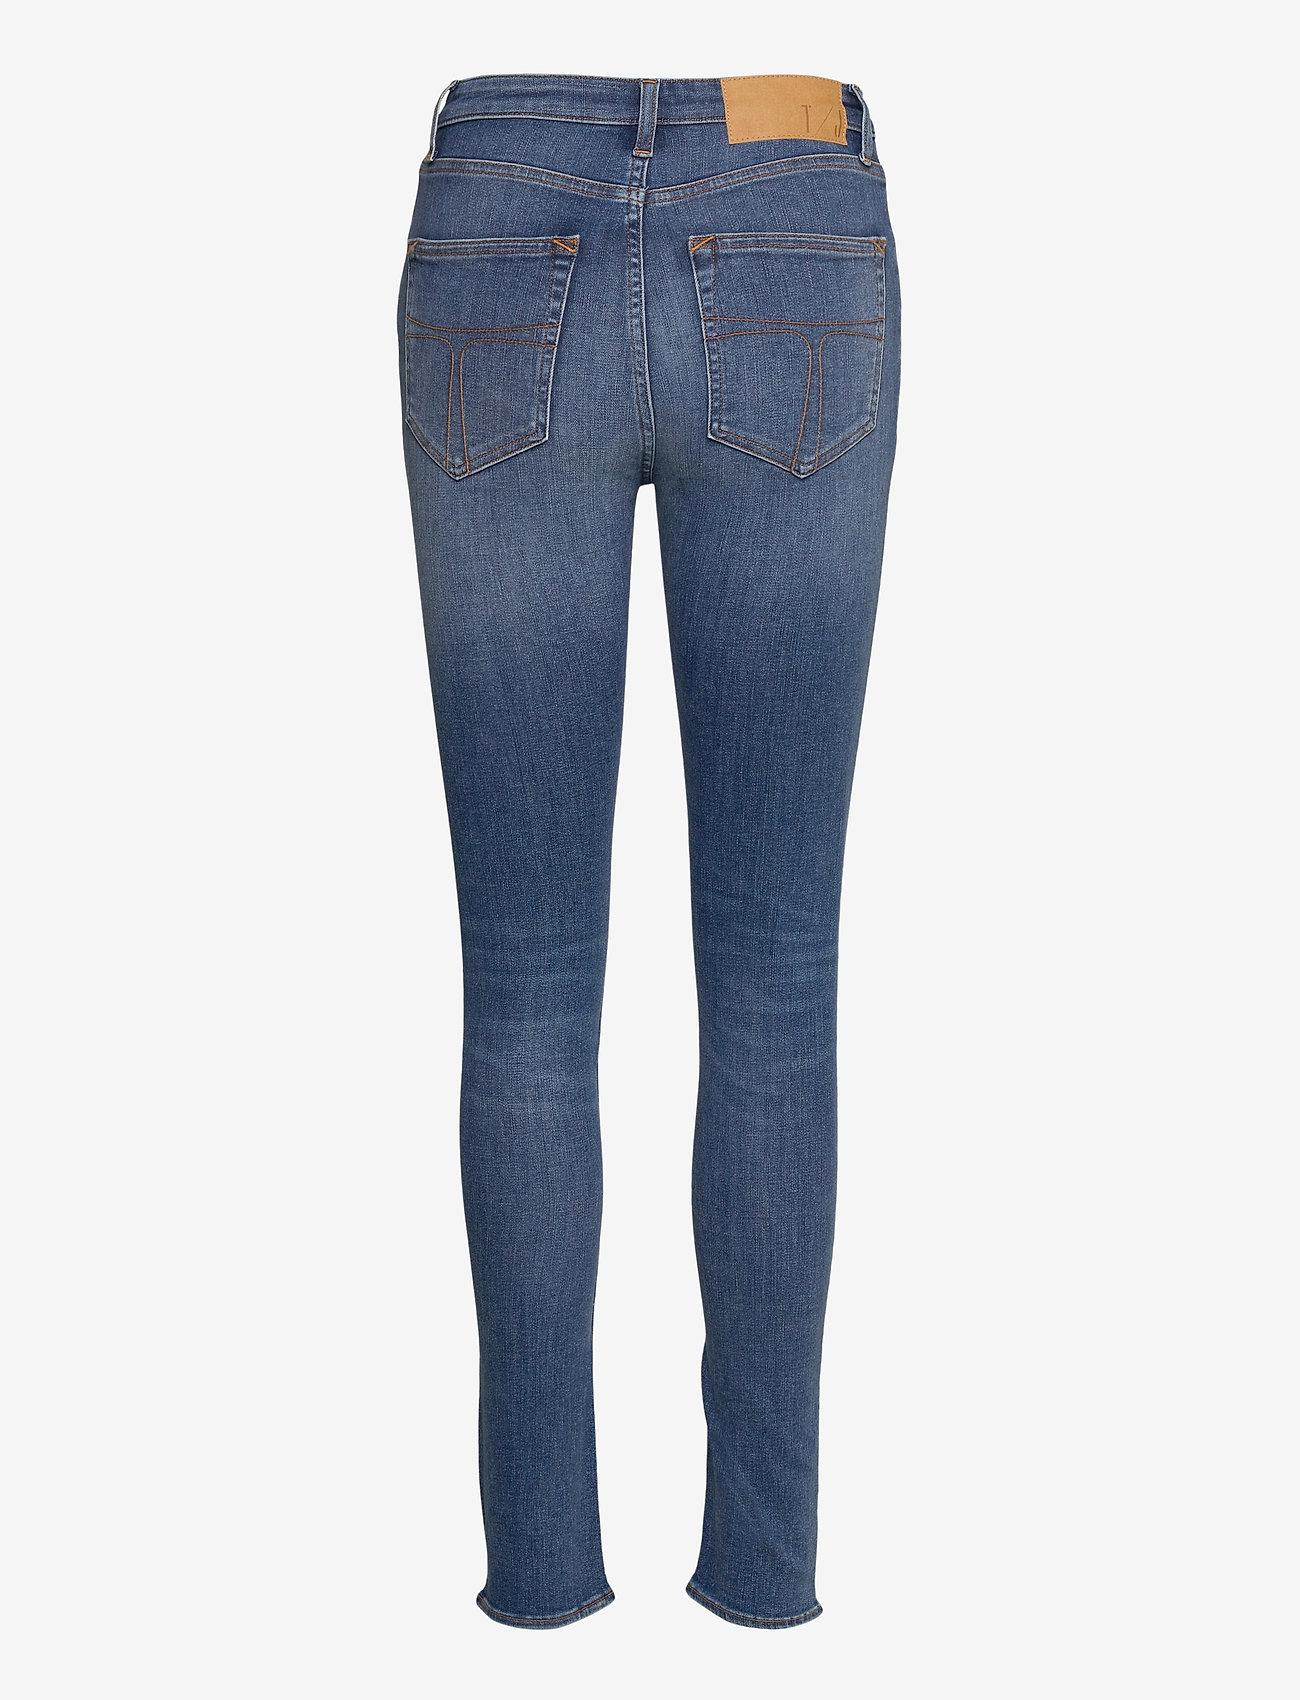 Tiger of Sweden Jeans - SHELLY - skinny jeans - medium blue - 1